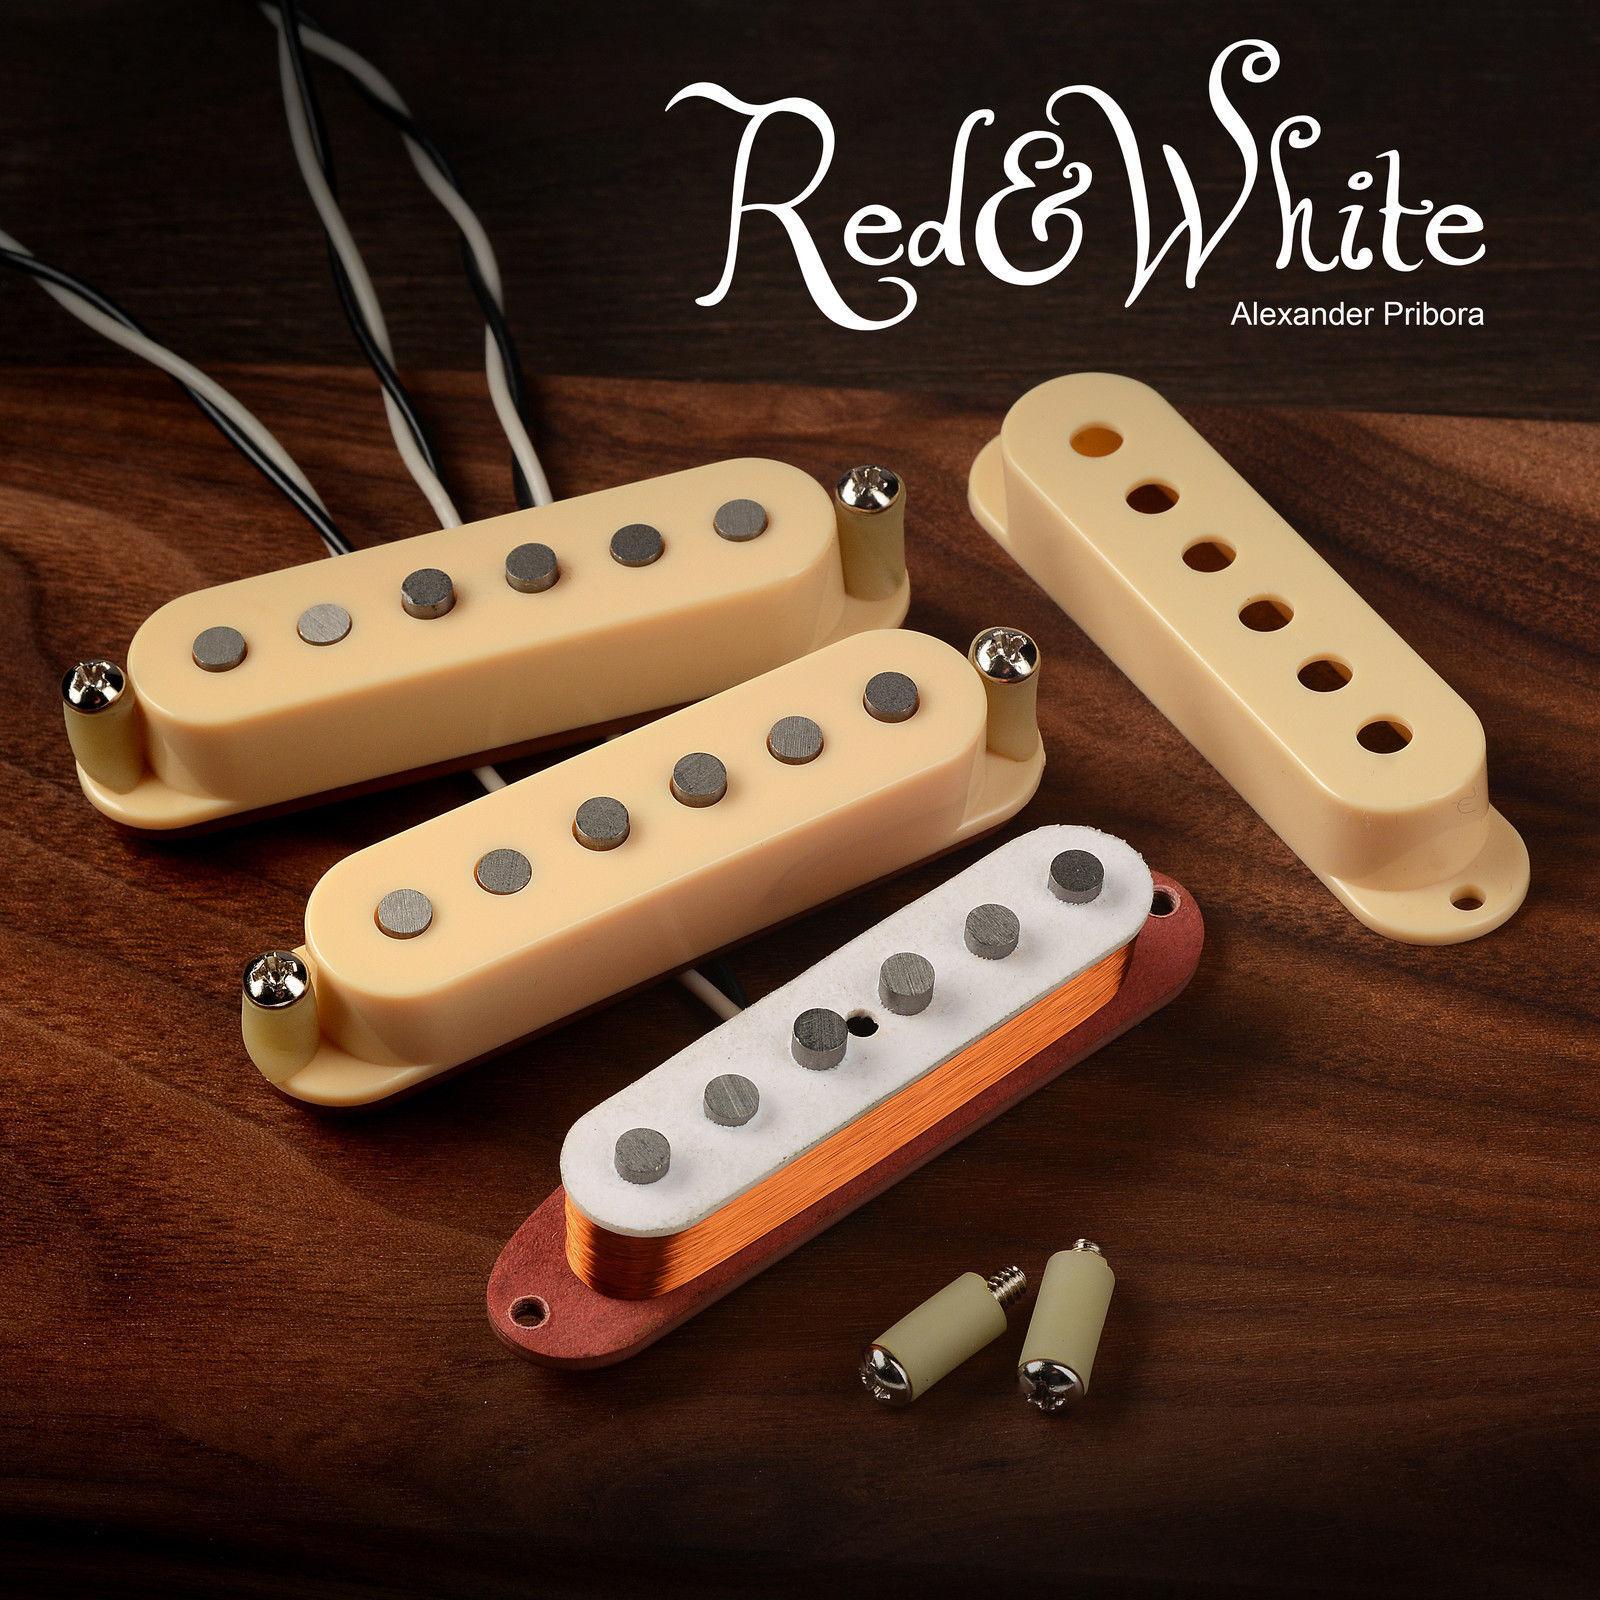 Stratocaster Pickups fit Fender Stratocaster Fullerton R&W style Alnico 5 set